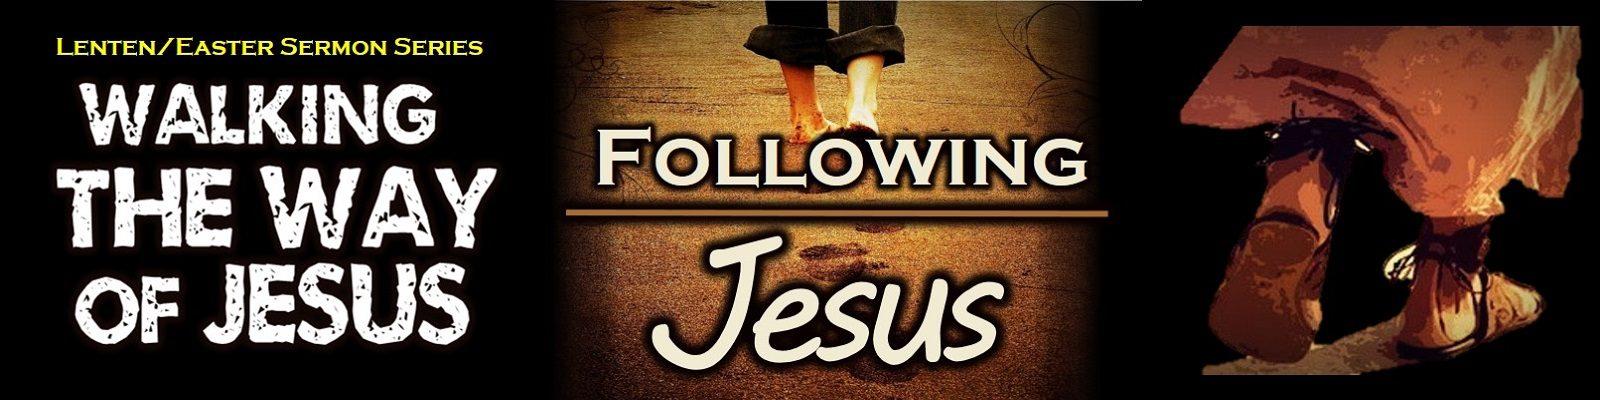 The Way Study #6 - Following Jesus